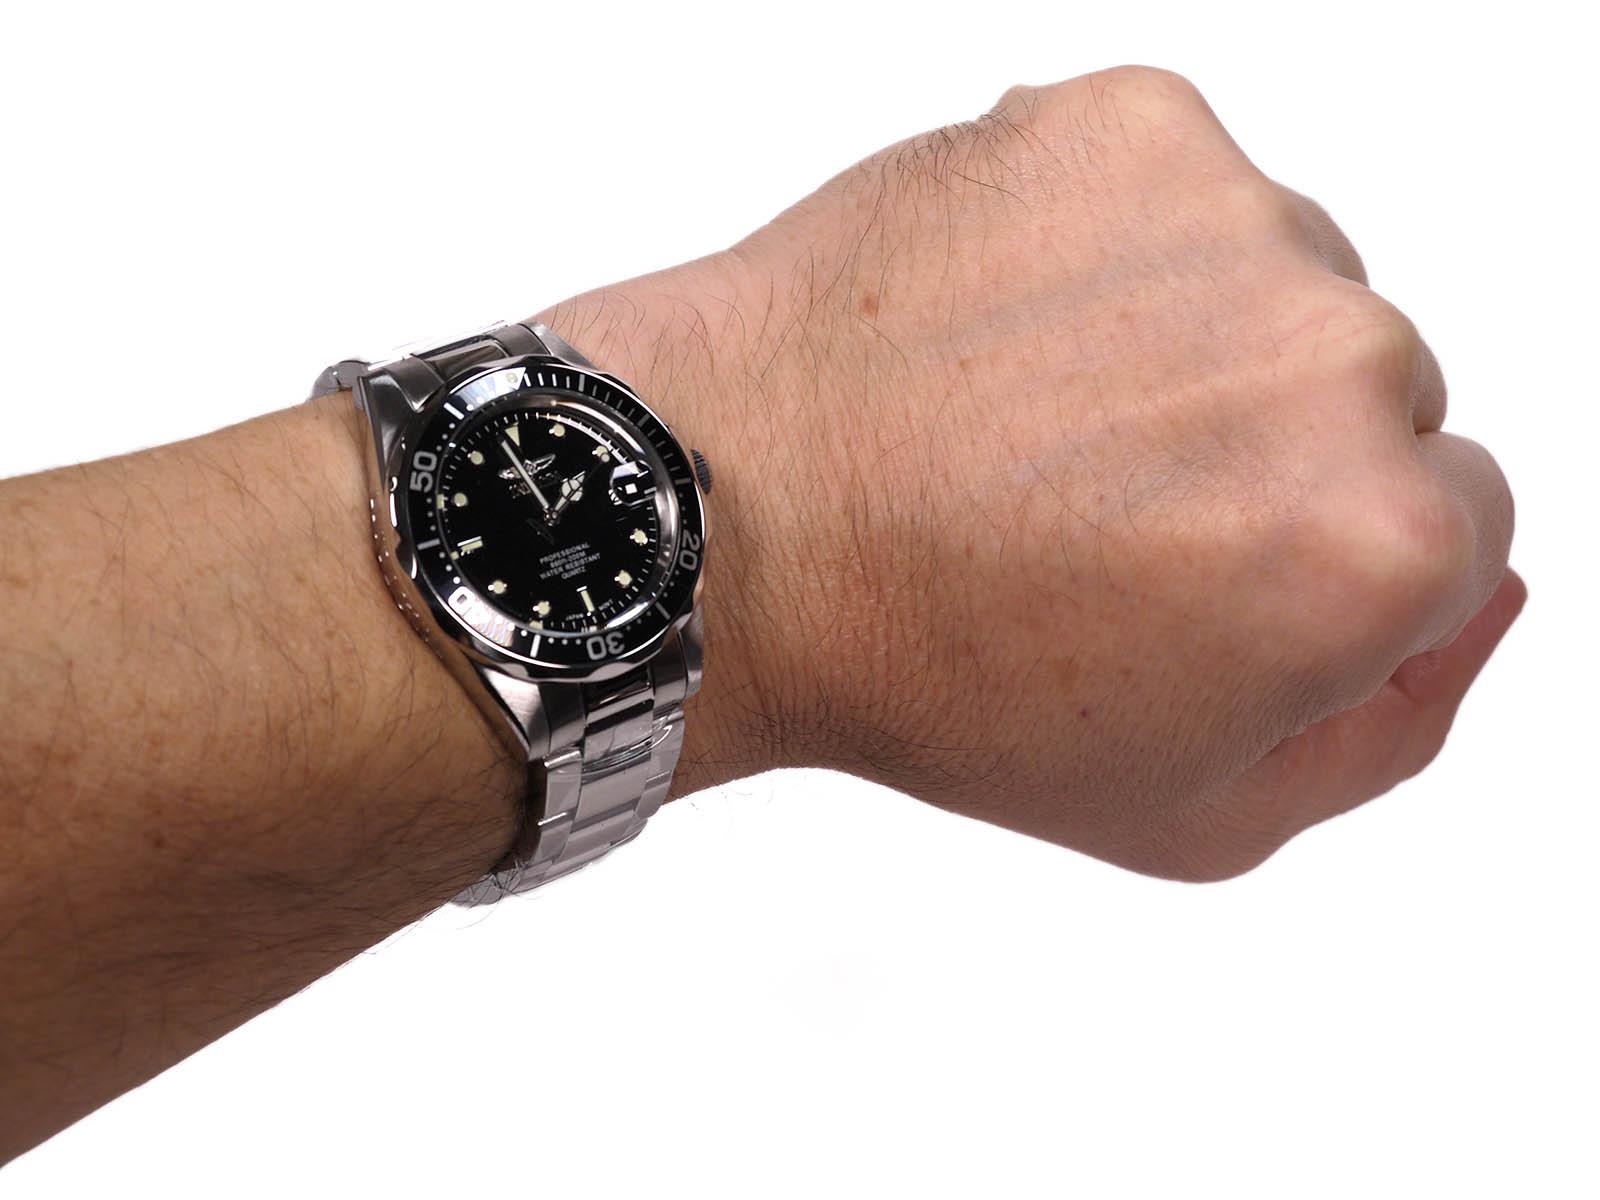 Invicta 8932 Pro Diver Quartz Stainless Steel Watch